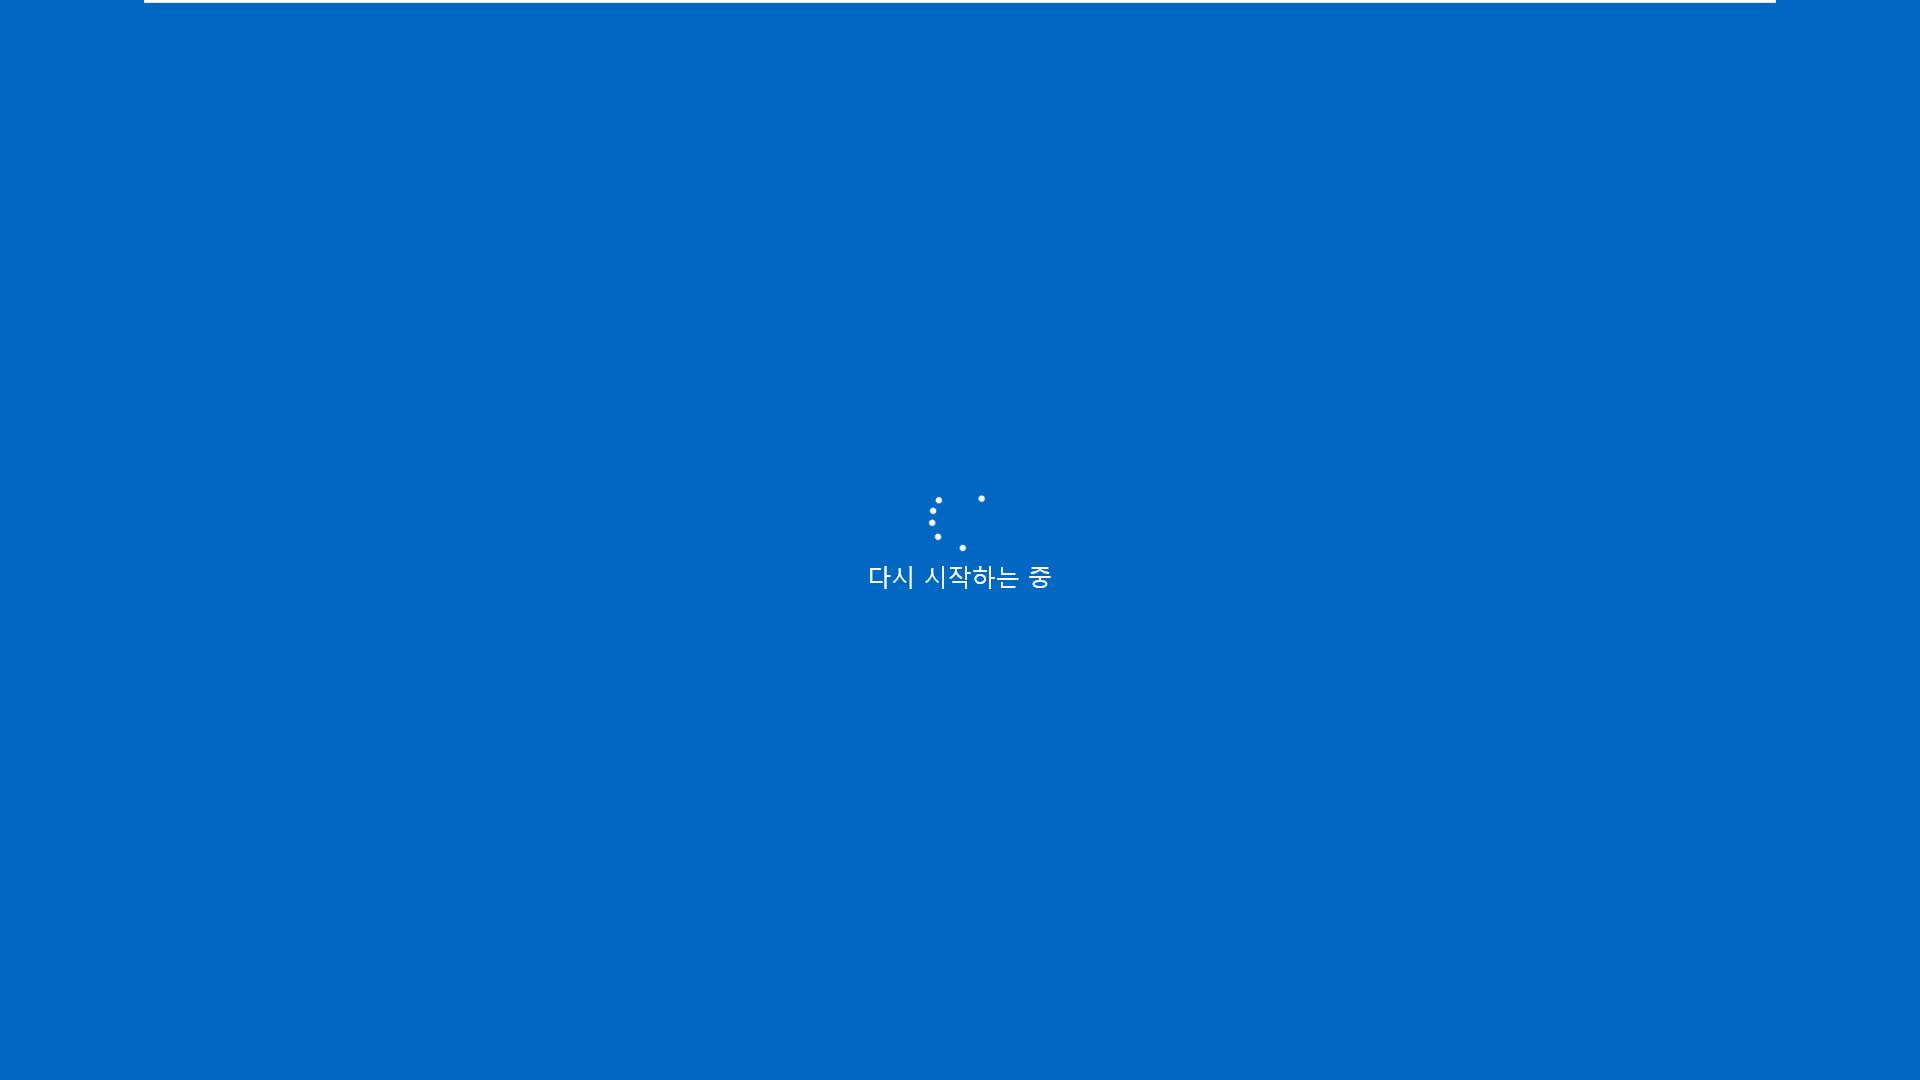 Windows 10 인사이더 프리뷰 버전 Dev (버전 21H2 예상) 21364 빌드에 Cloud Edition 설치 + Pro와 전환 테스트 = 잘 전환됩니다 2021-04-29_183019.jpg